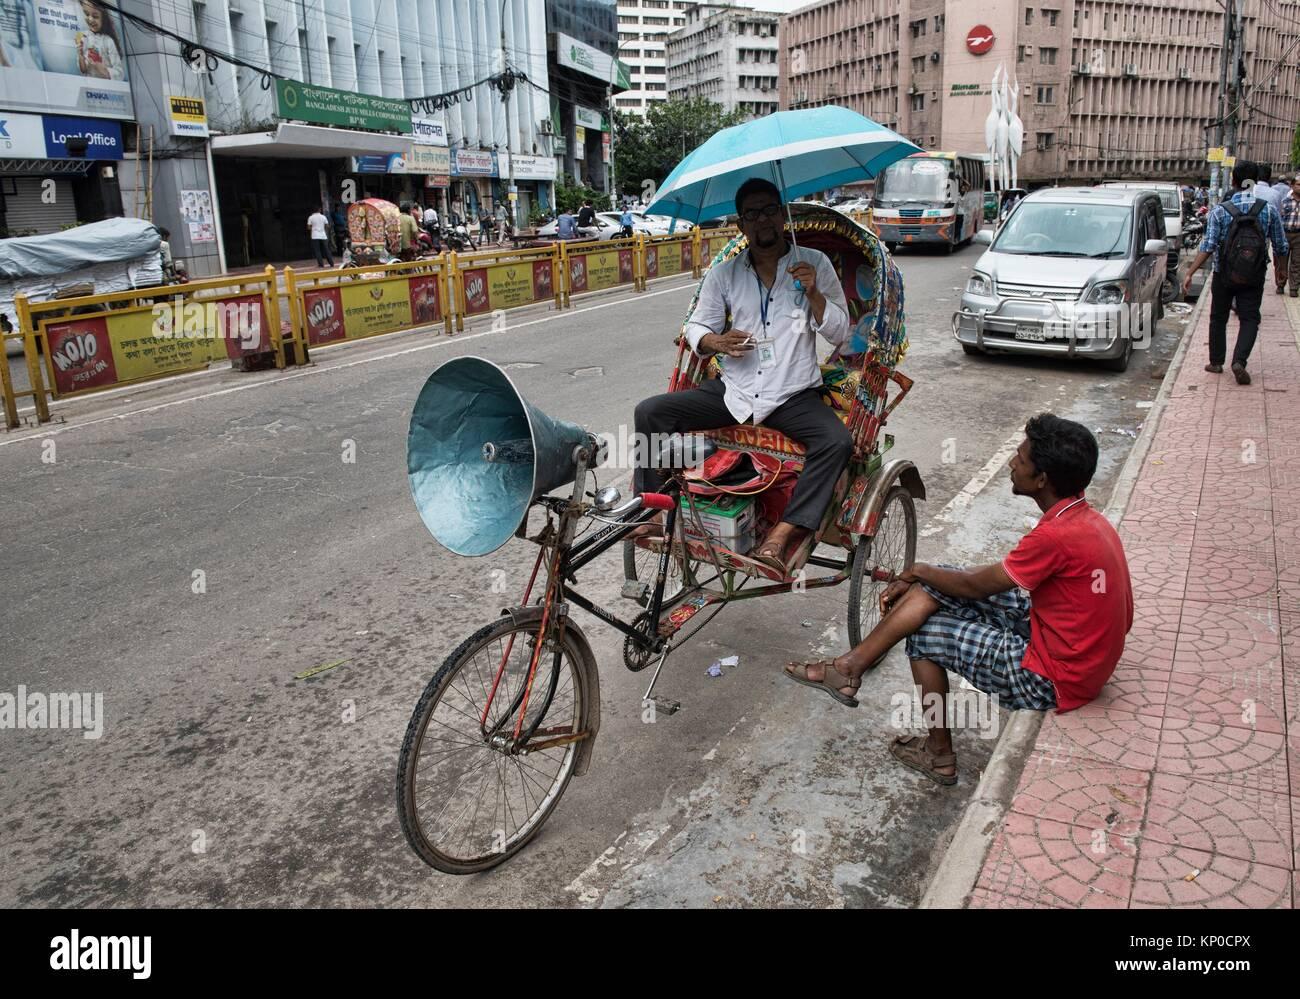 Rickshaws are the only way to get around in Old Dhaka, Bangladesh. - Stock Image